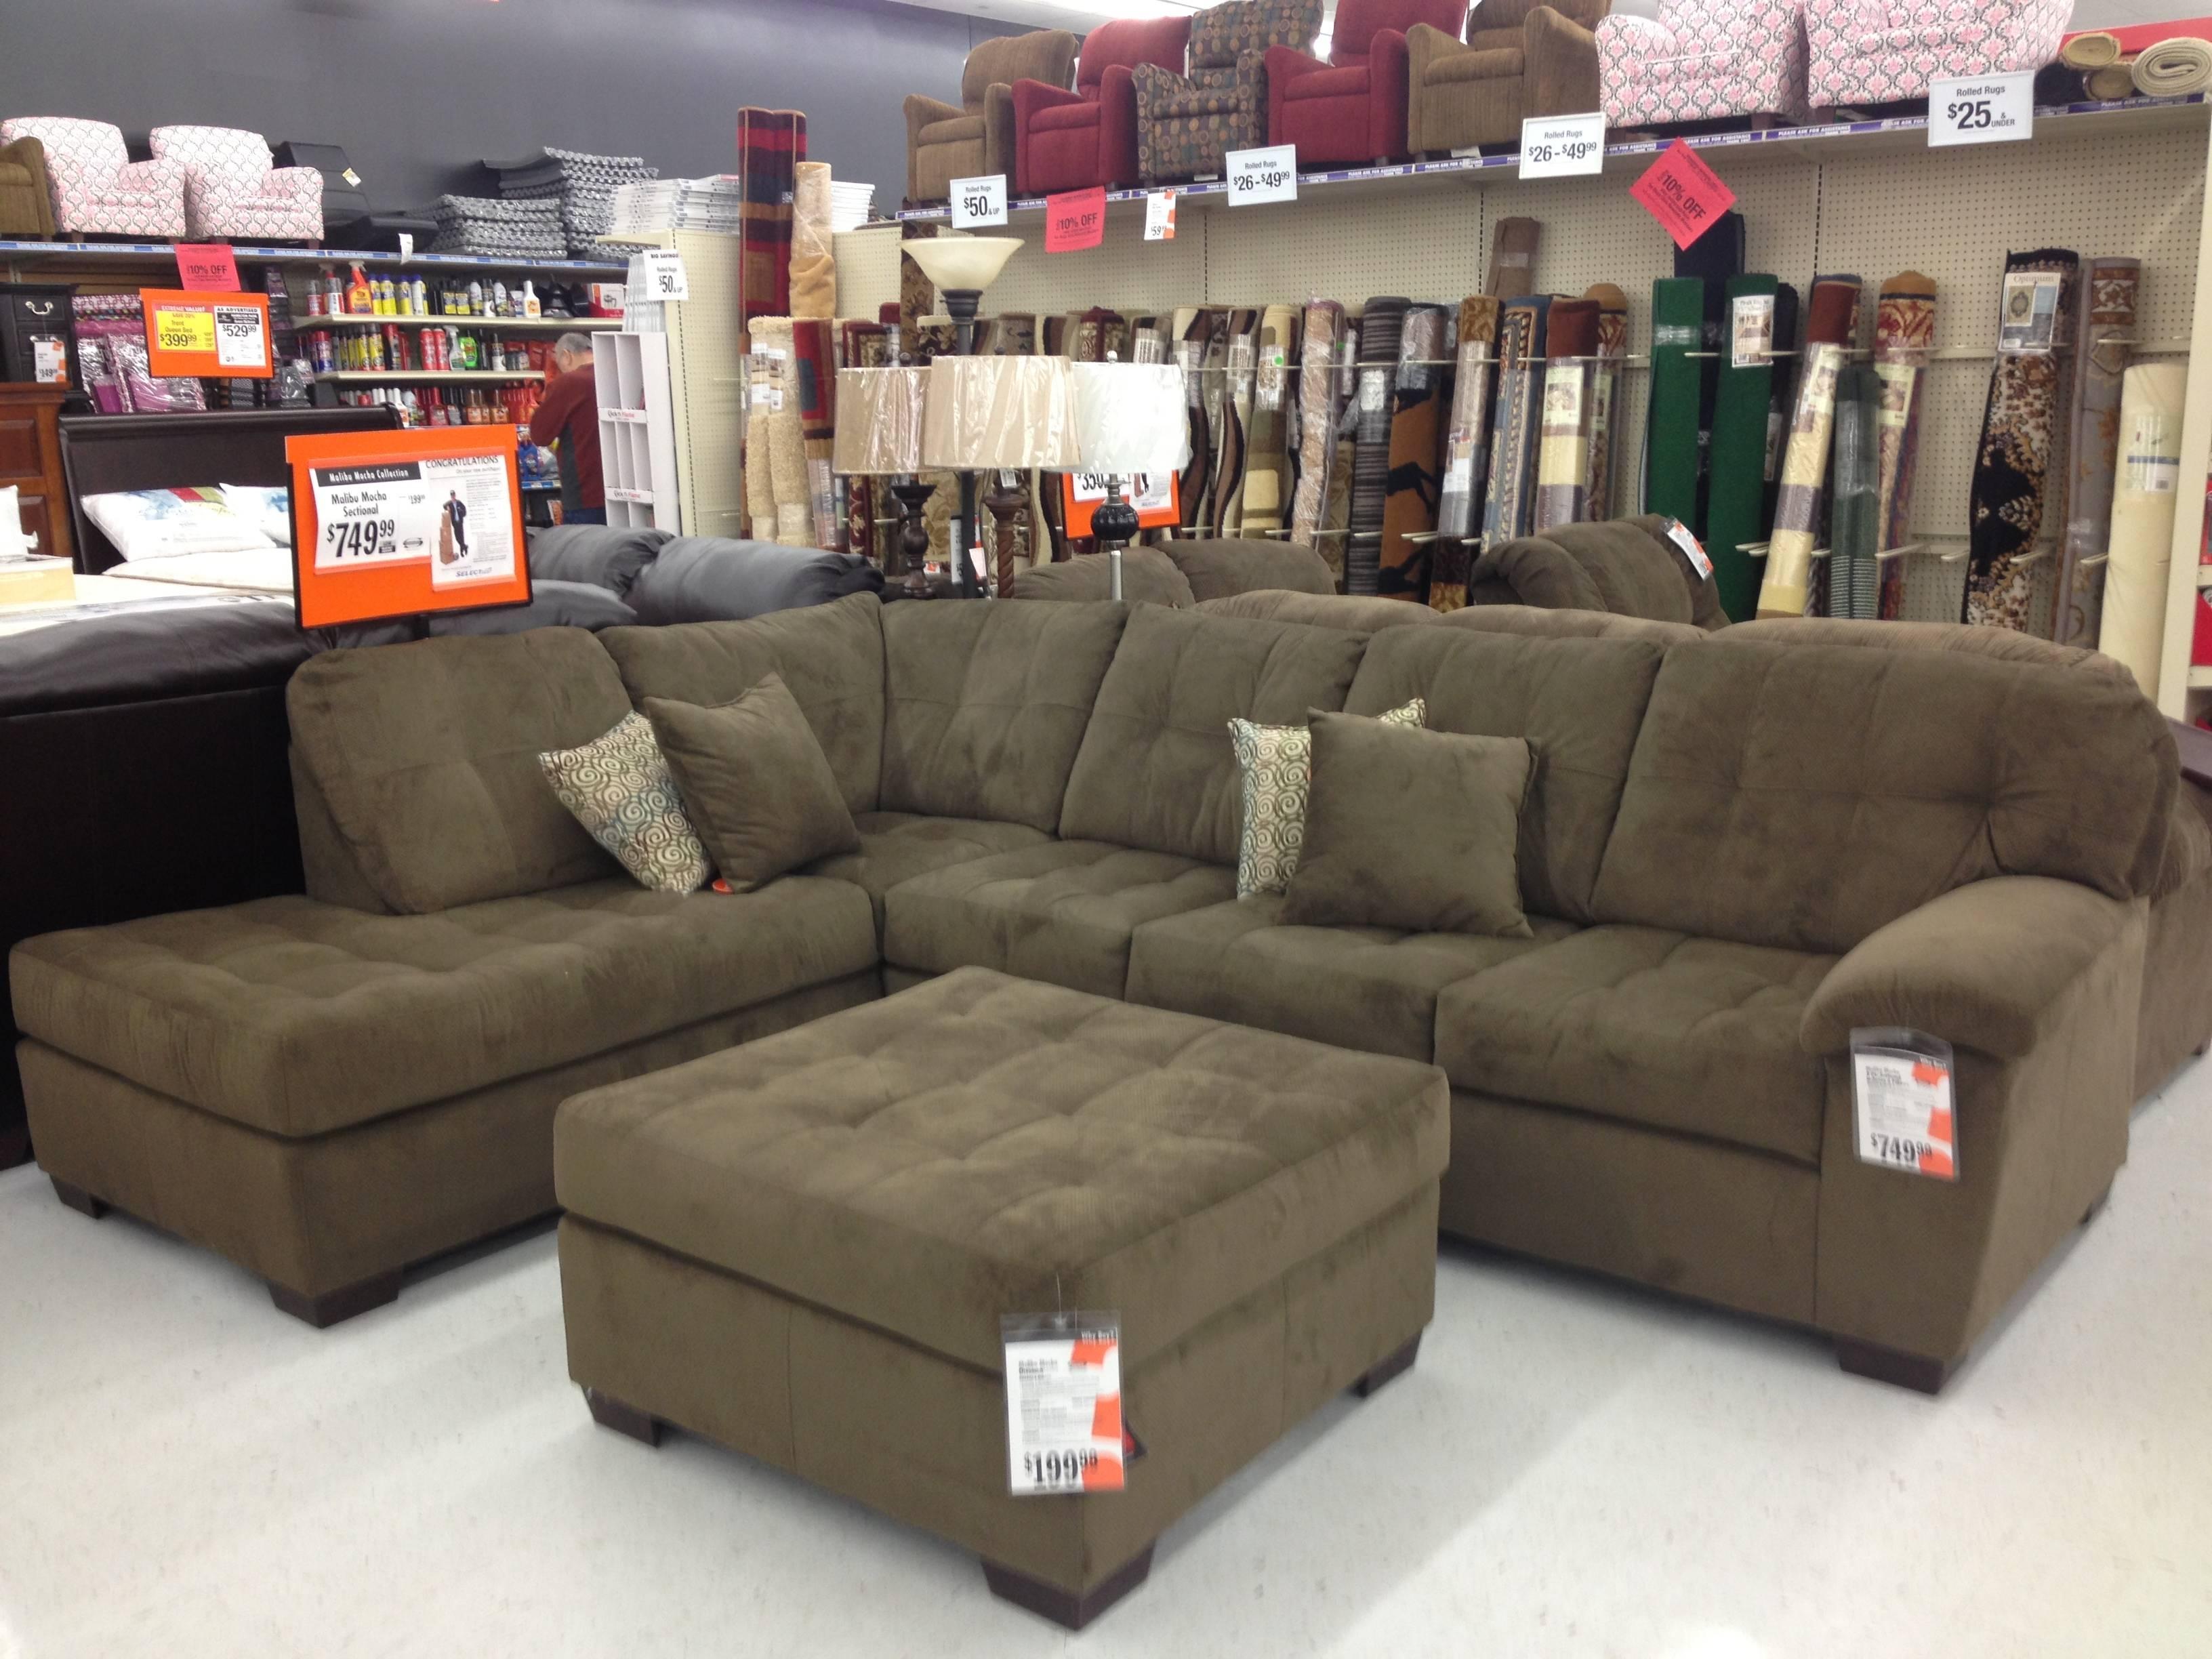 Big Lots Sofa for Big Lots Sofa (Image 4 of 30)